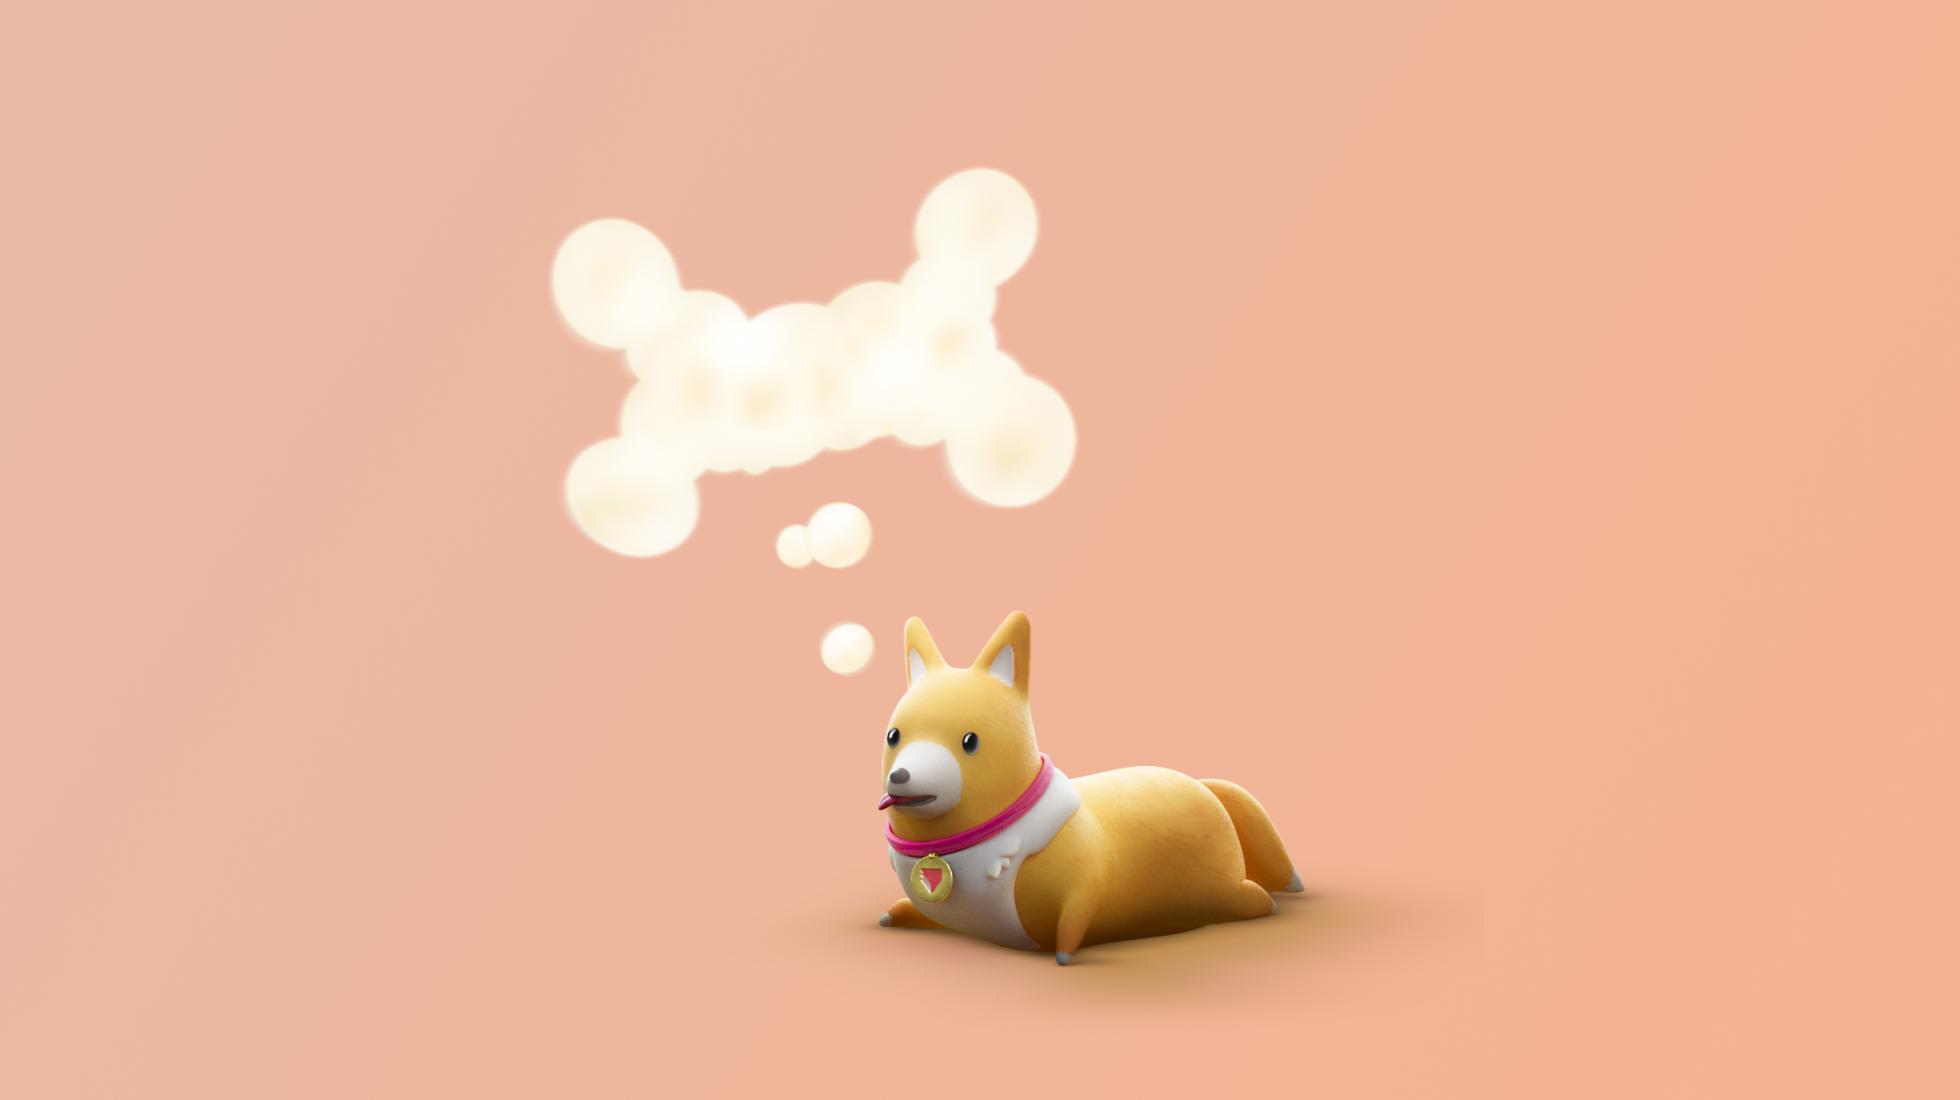 ProtoPie pie dog thinking of an idea